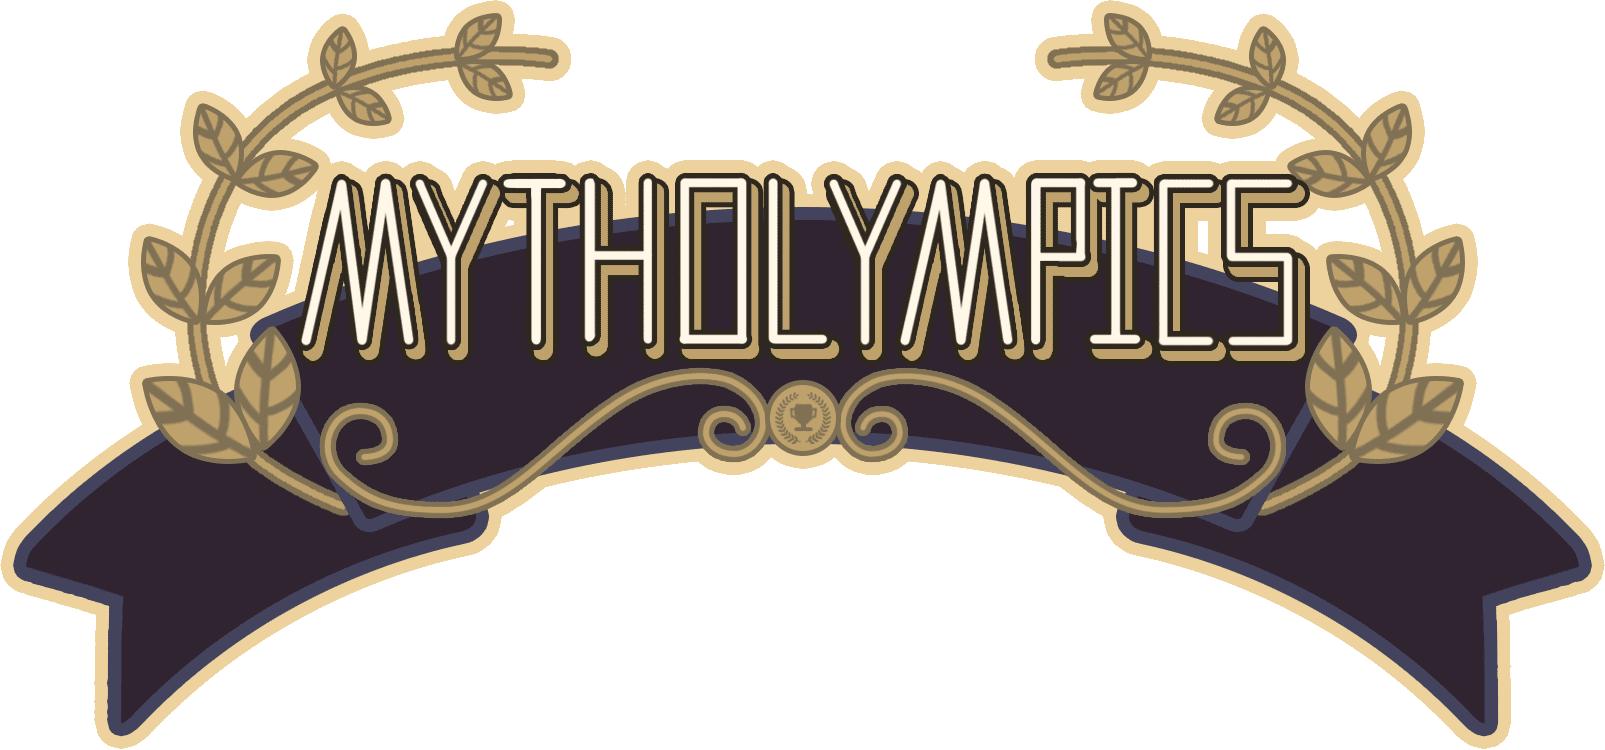 Mytholympics Title